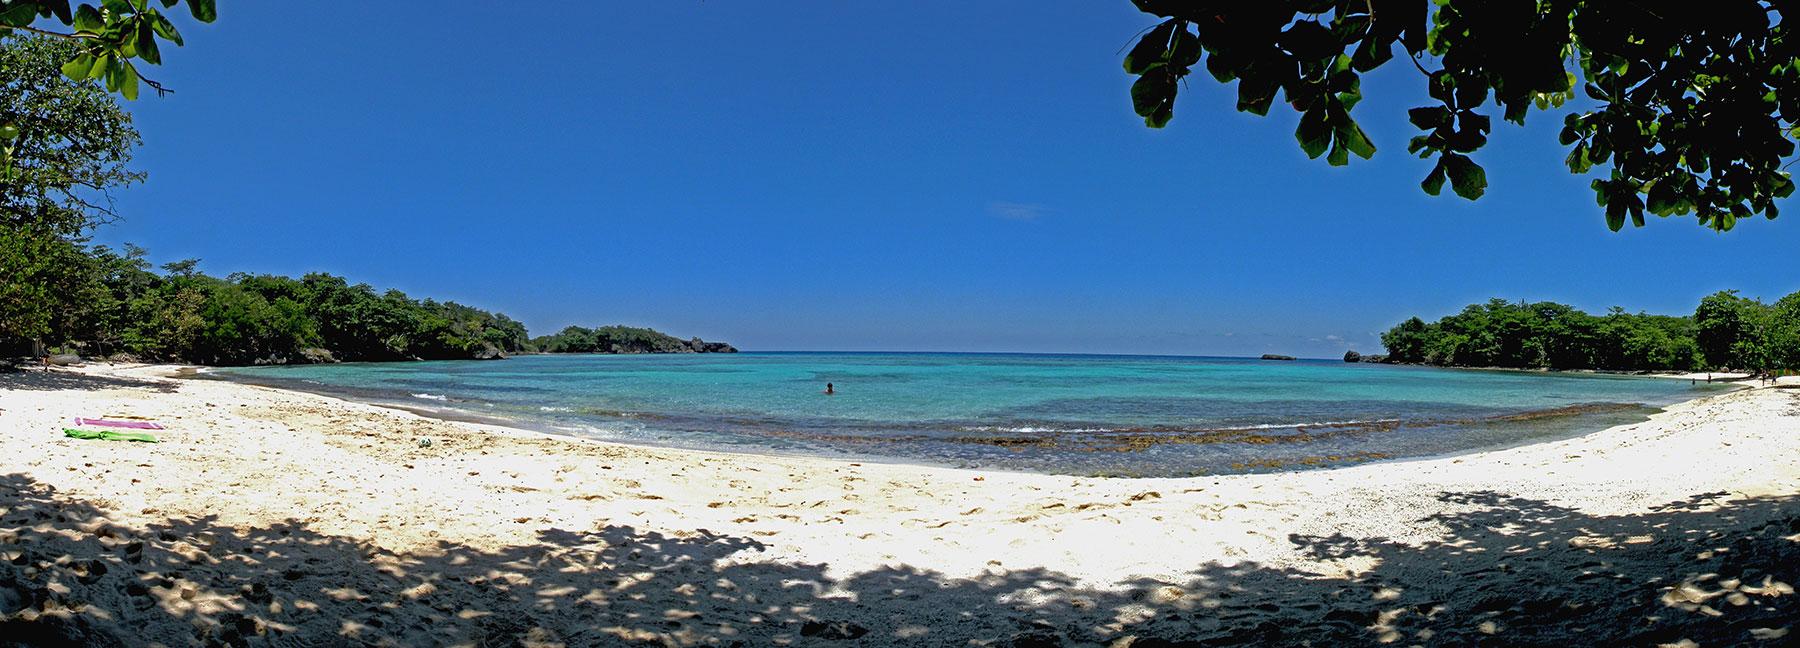 Giamaica le spiagge, Winneifred Beach